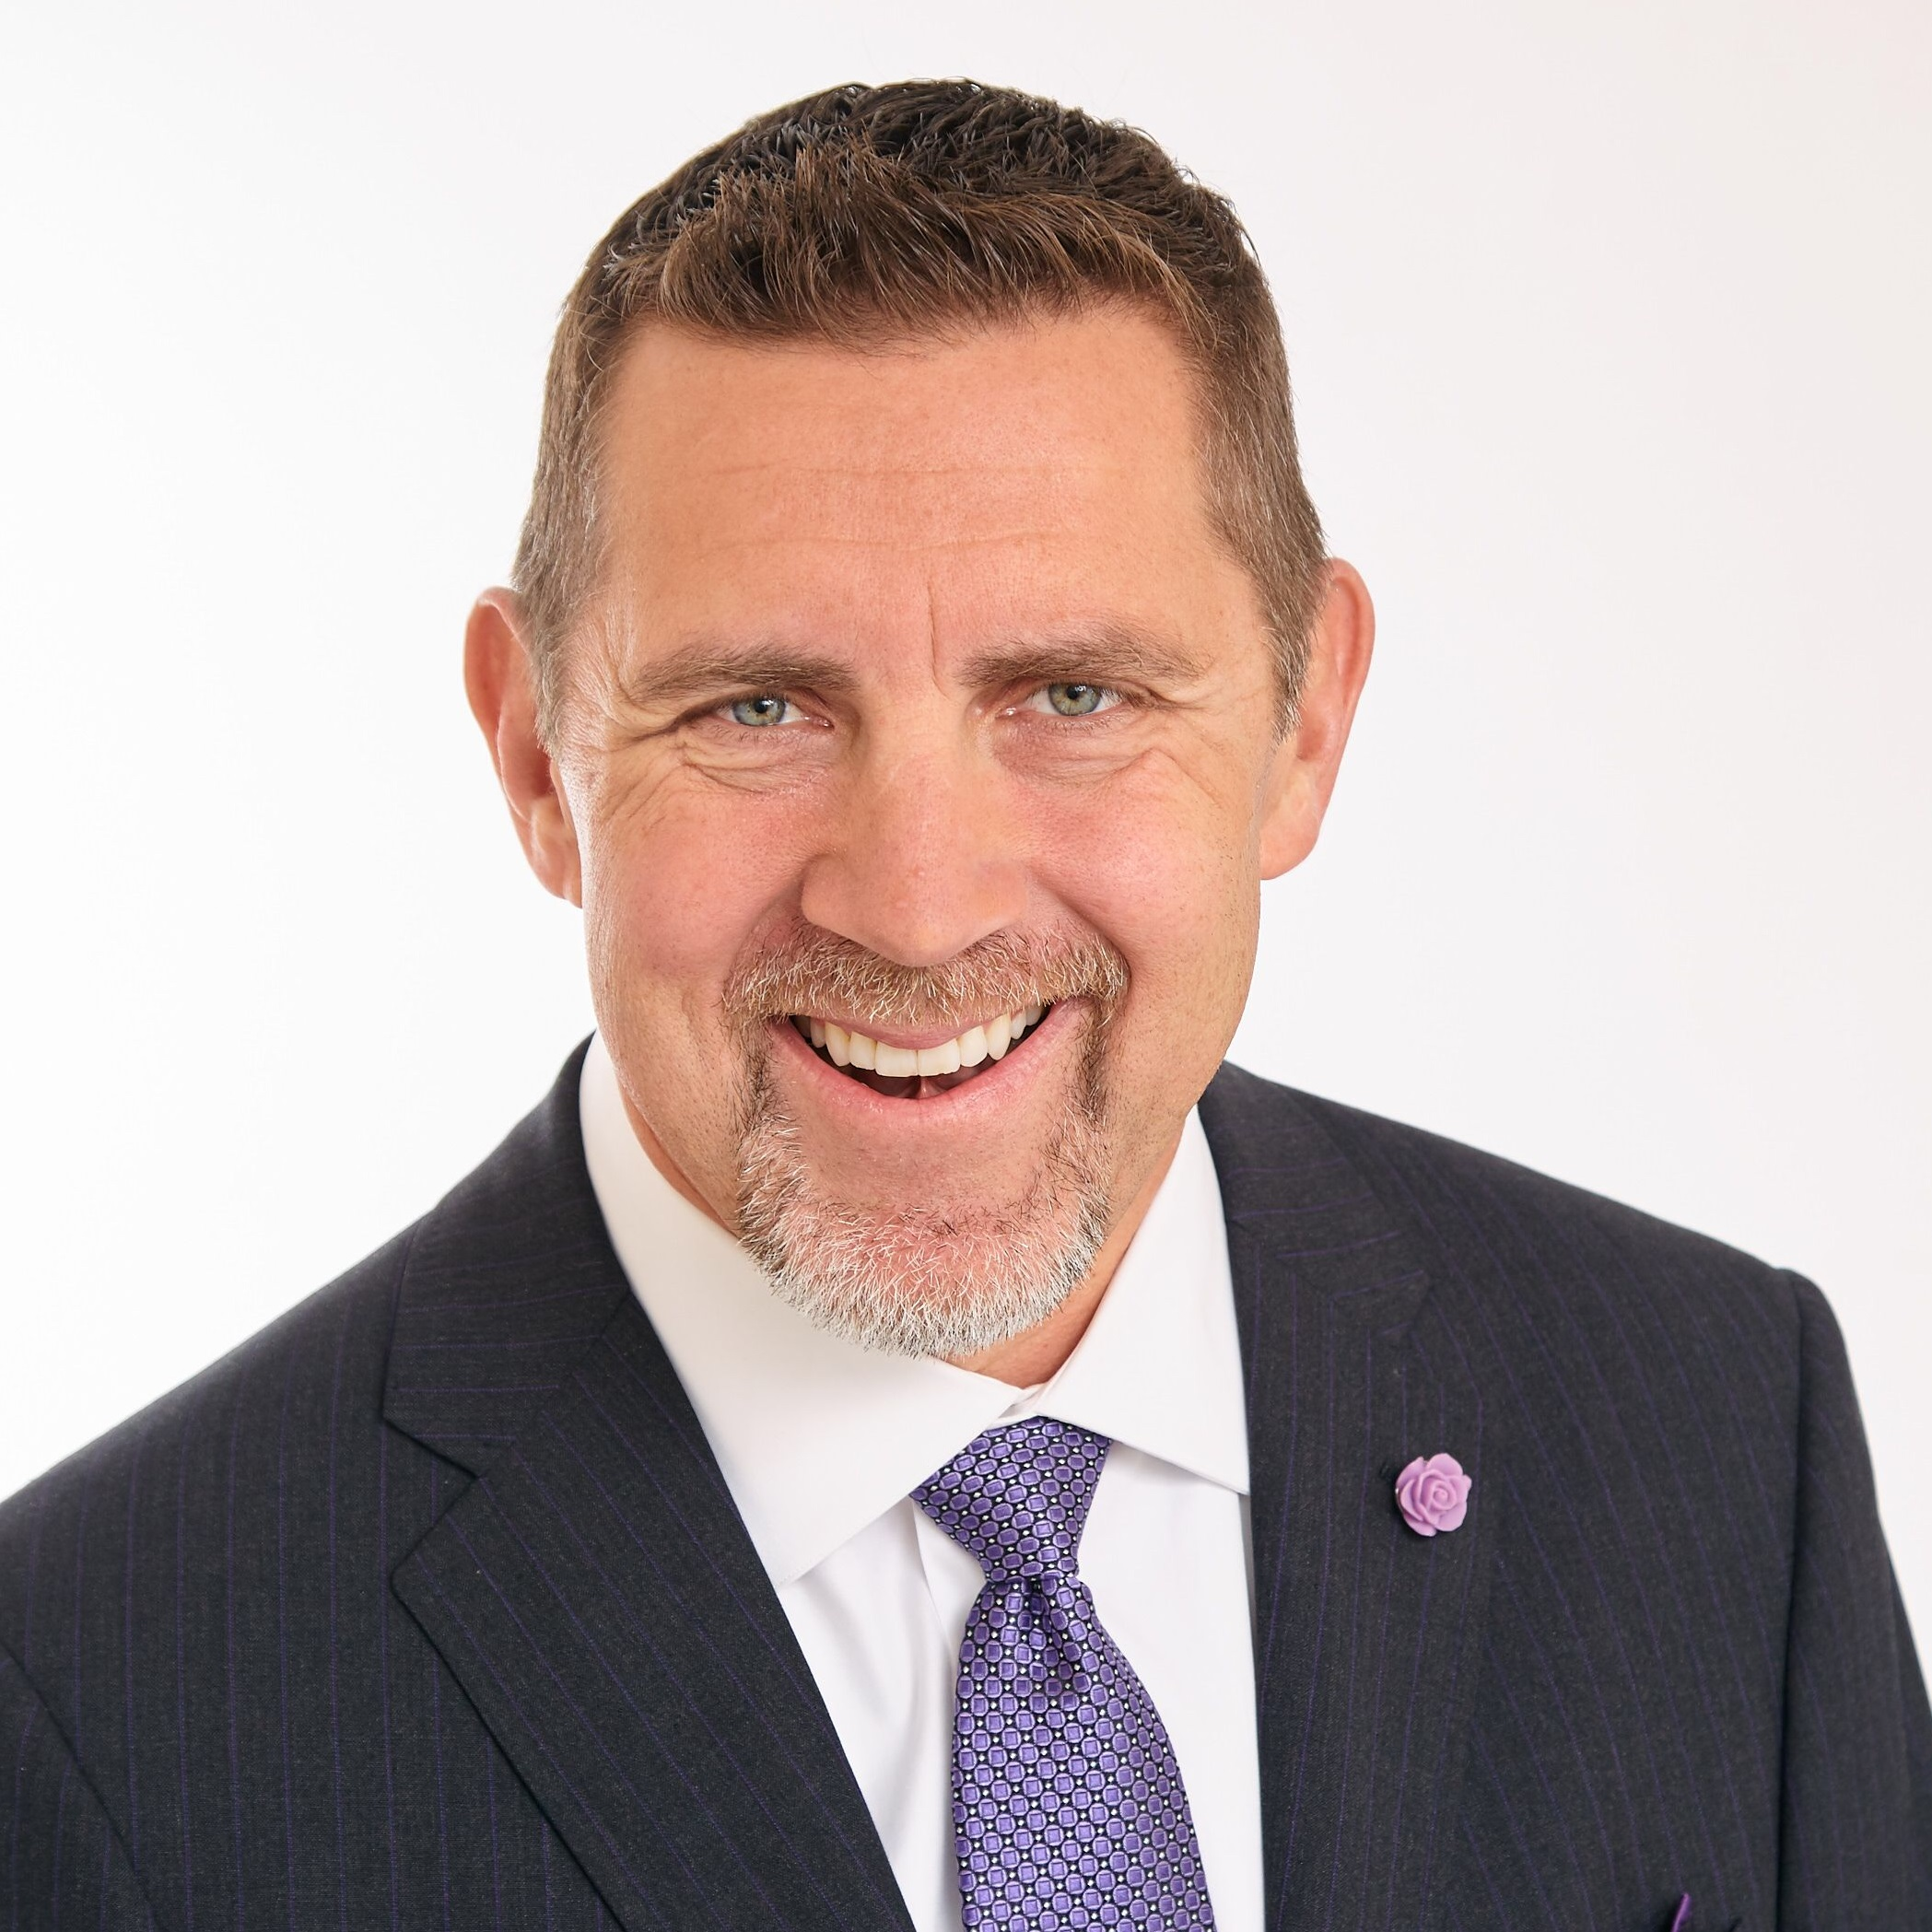 Dr. Josh Luke